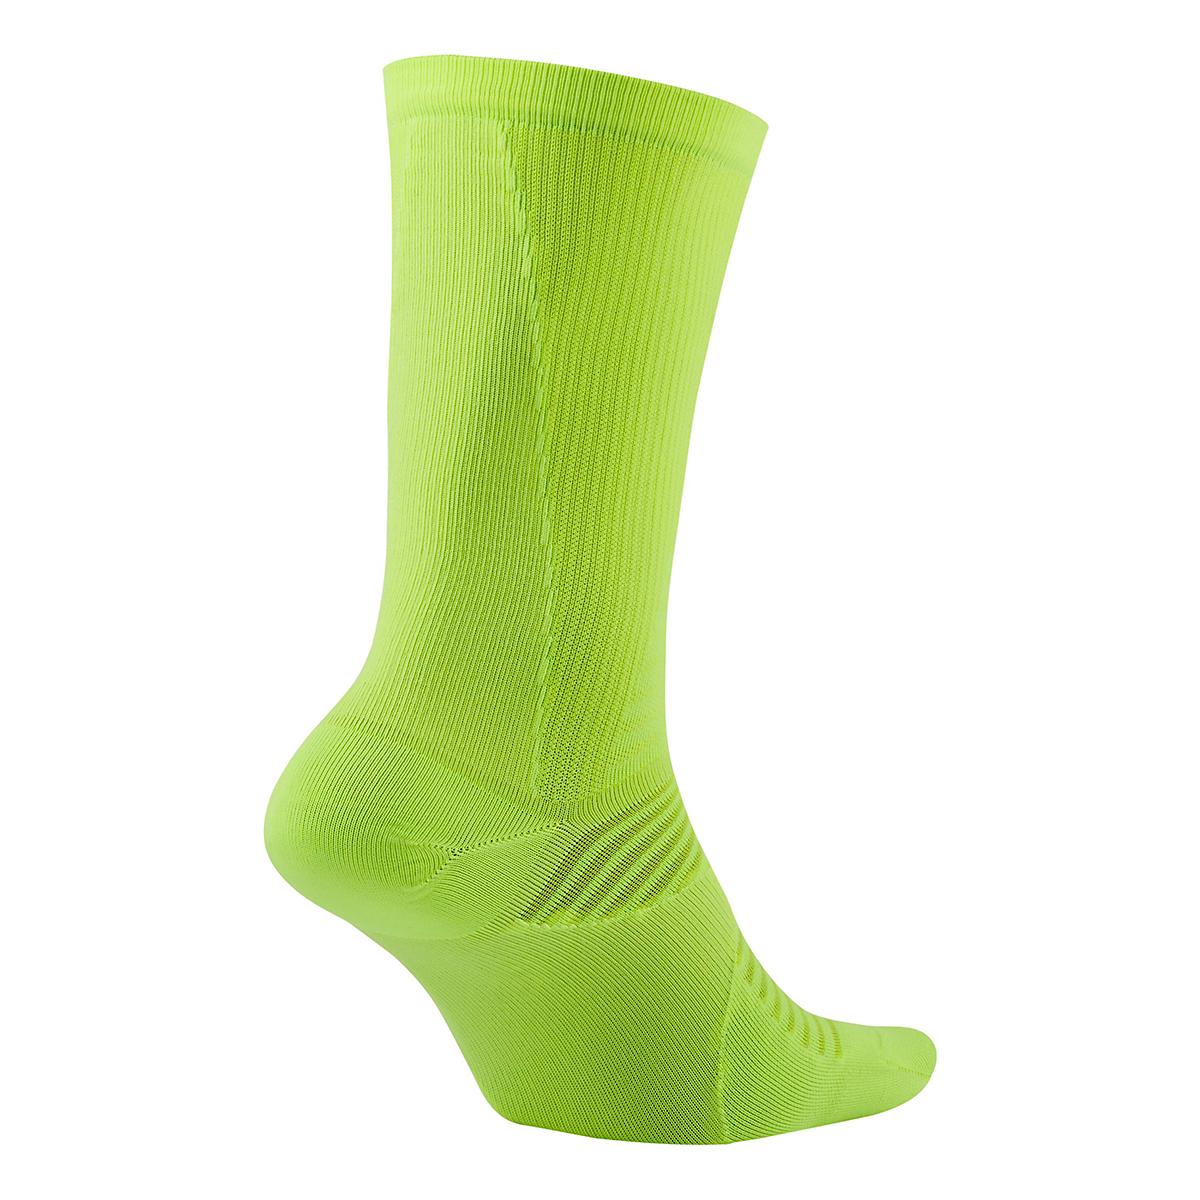 Nike Spark Lightweight Crew Running Socks, , large, image 2